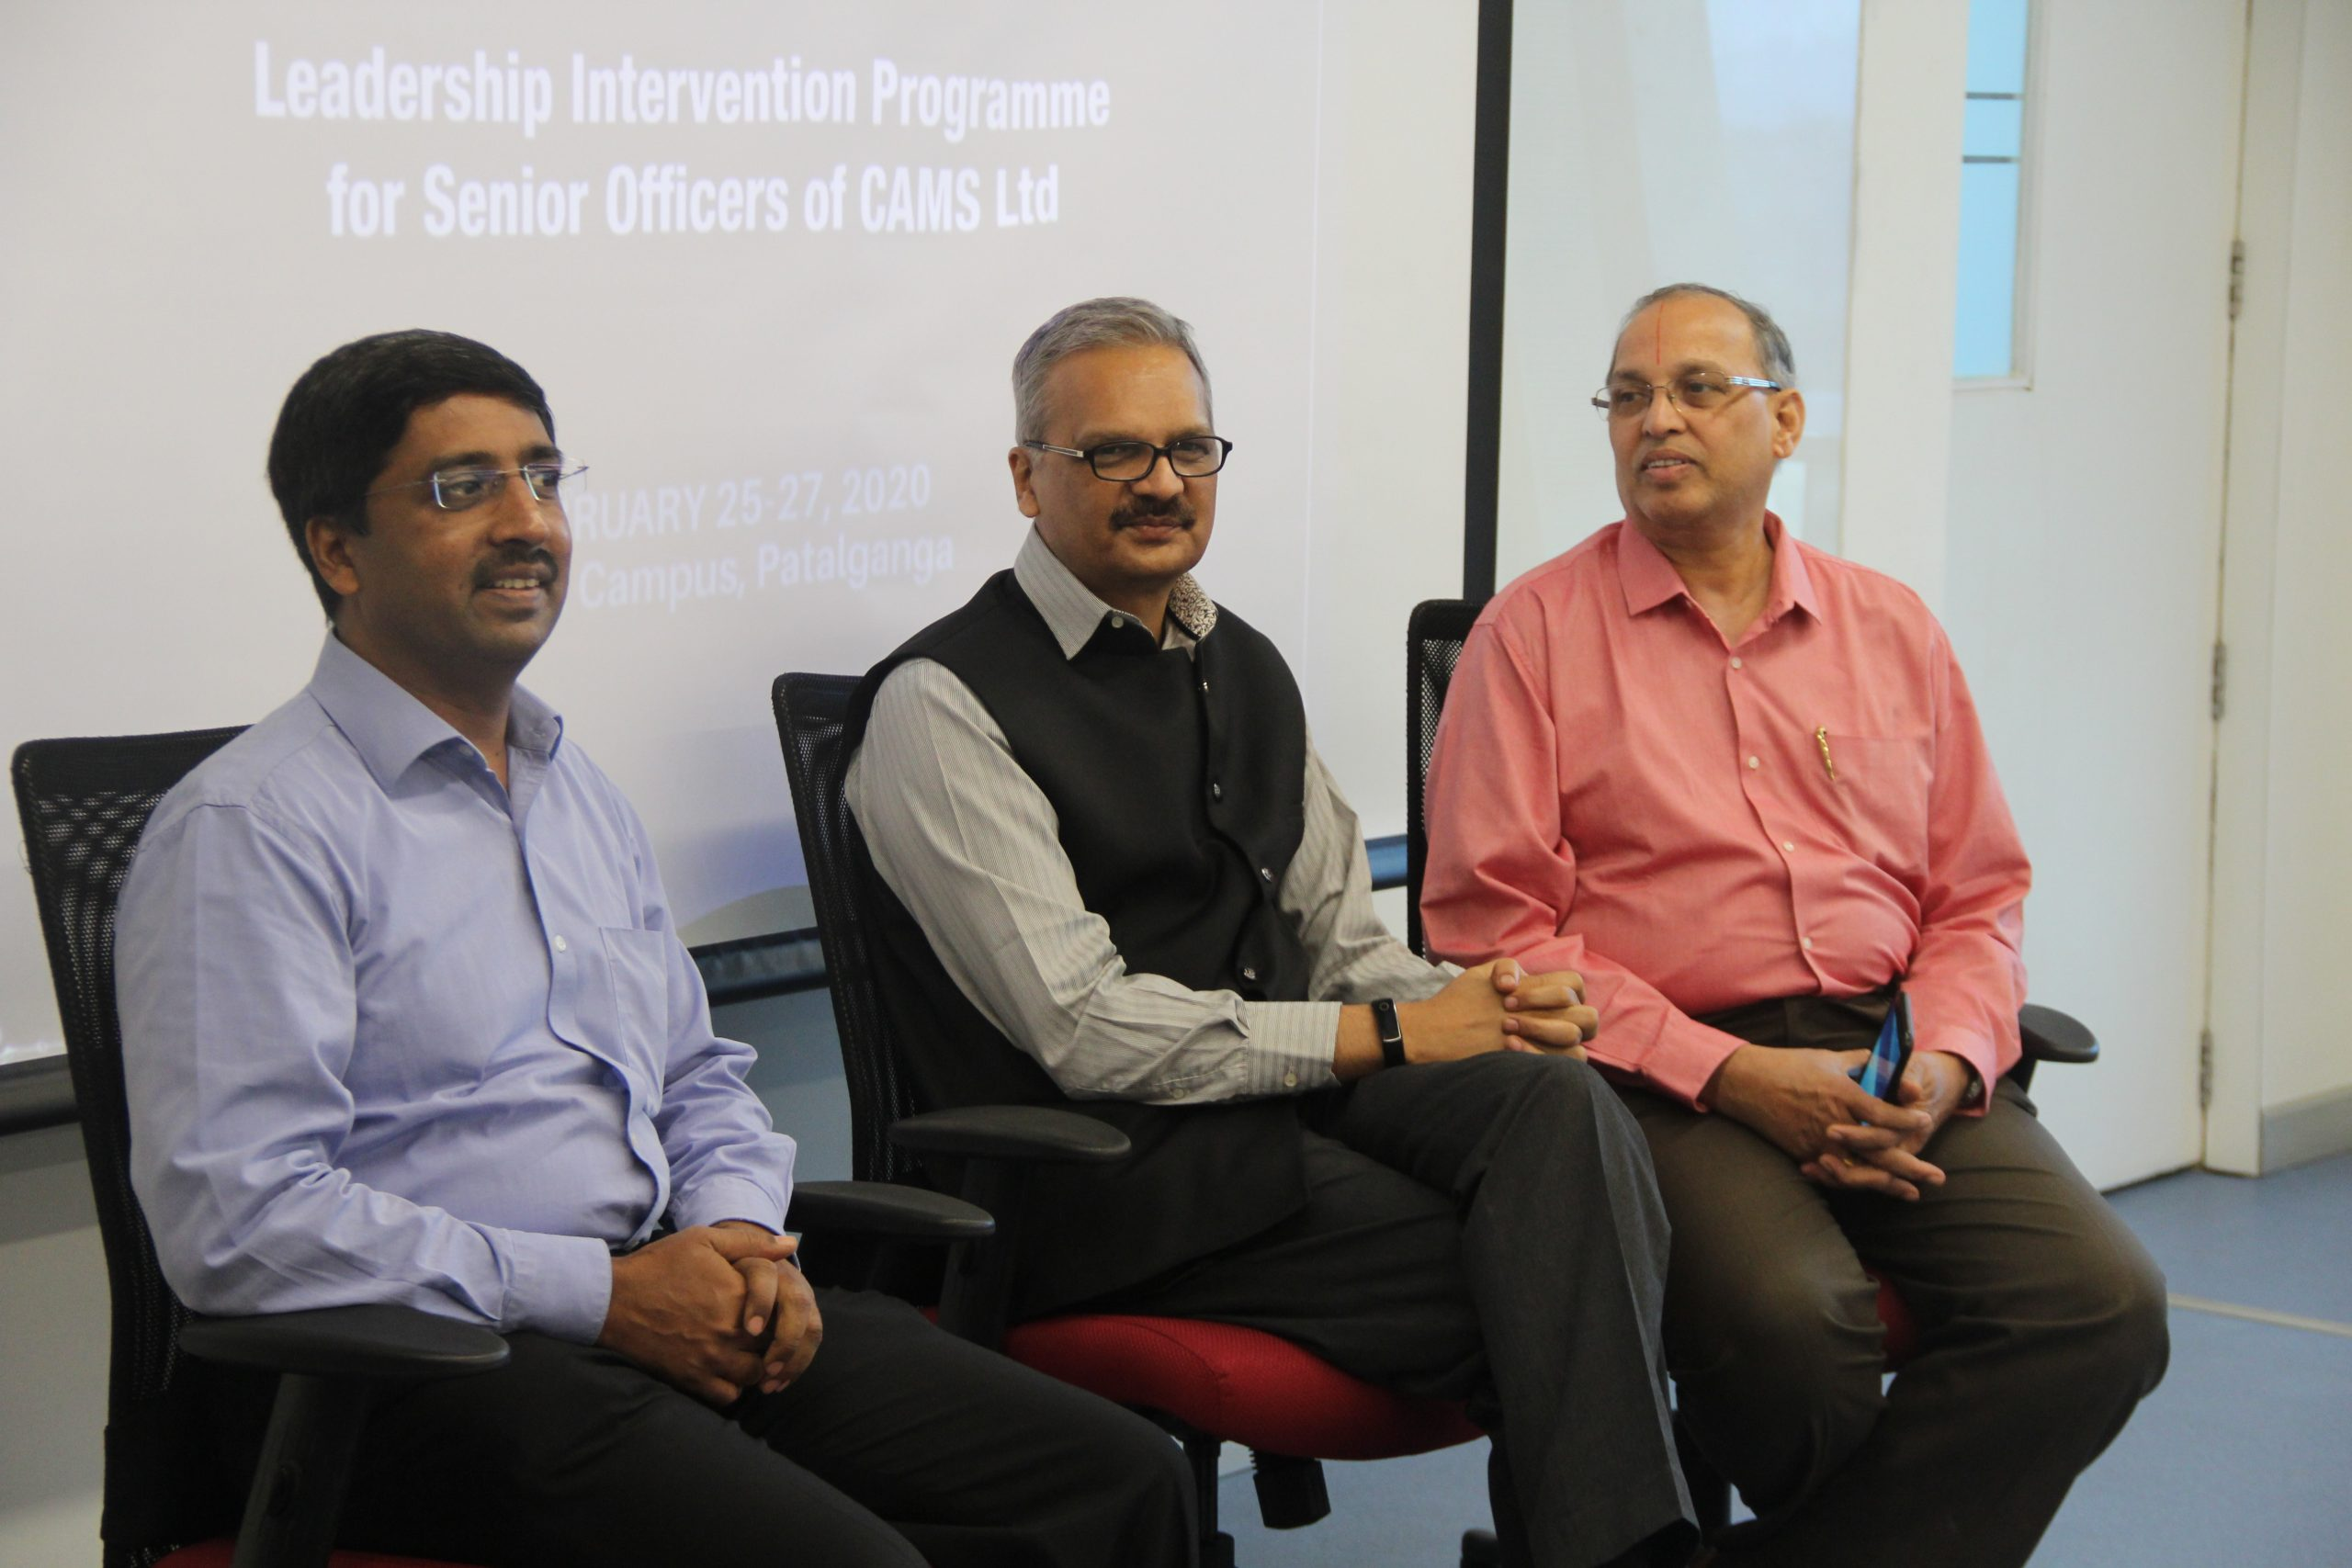 Leadership Intervention Programme for Senior Officers of CAMS Ltd| February 25-27, 2020